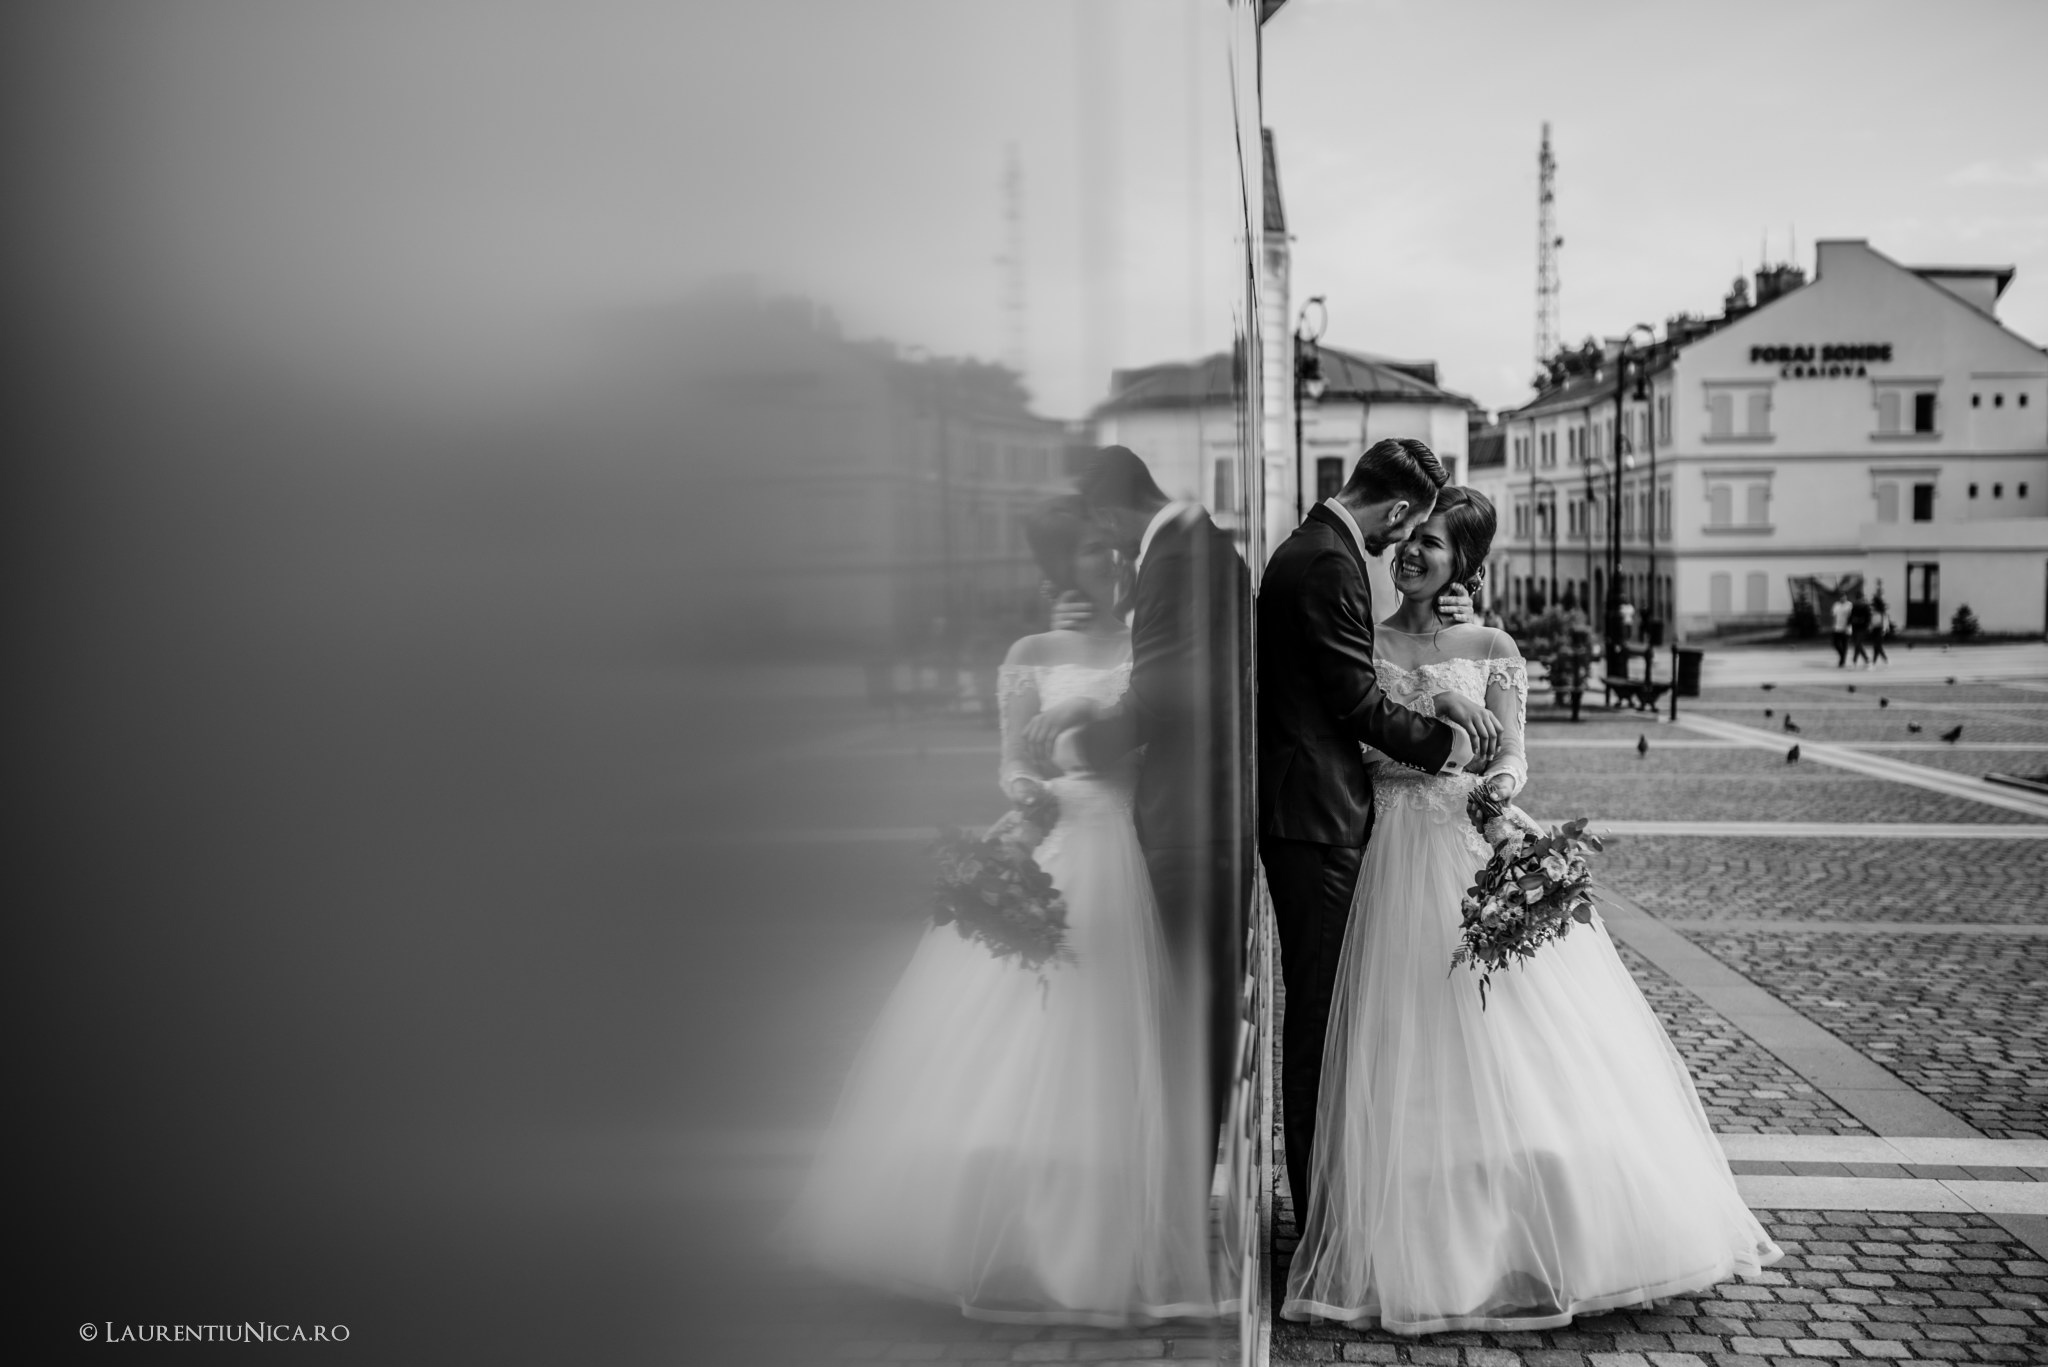 Alina si Andrei fotograf nunta laurentiu nica craiova 40 - Alina & Andrei | Fotografii nunta